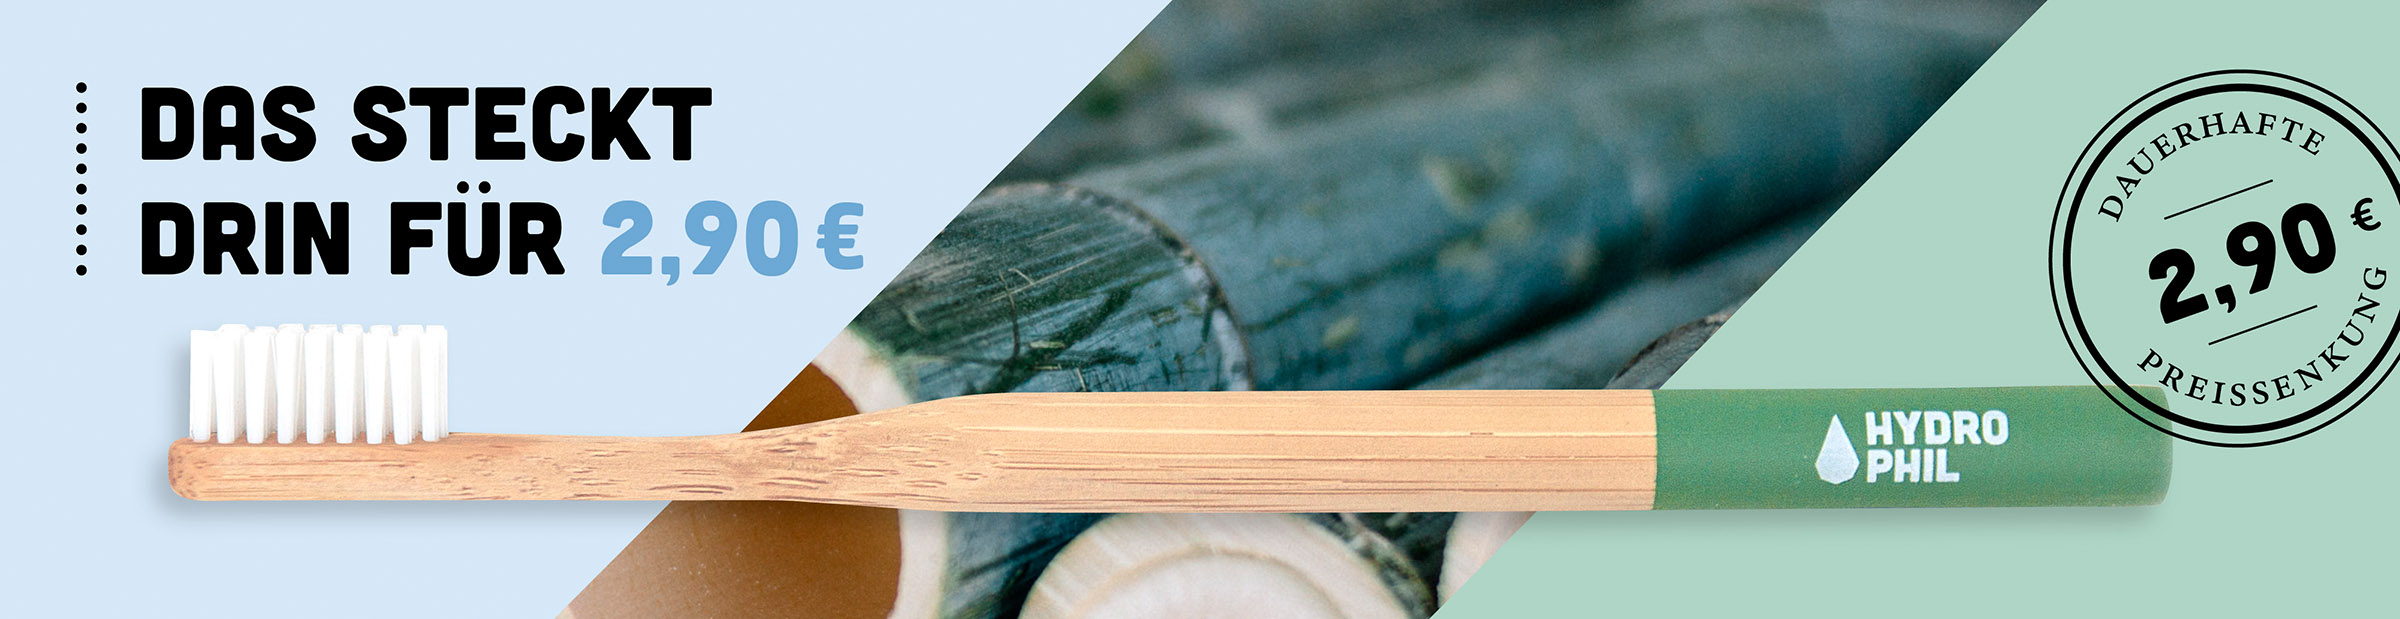 Preissenkung Hydrophil Bambus Zahnbürste